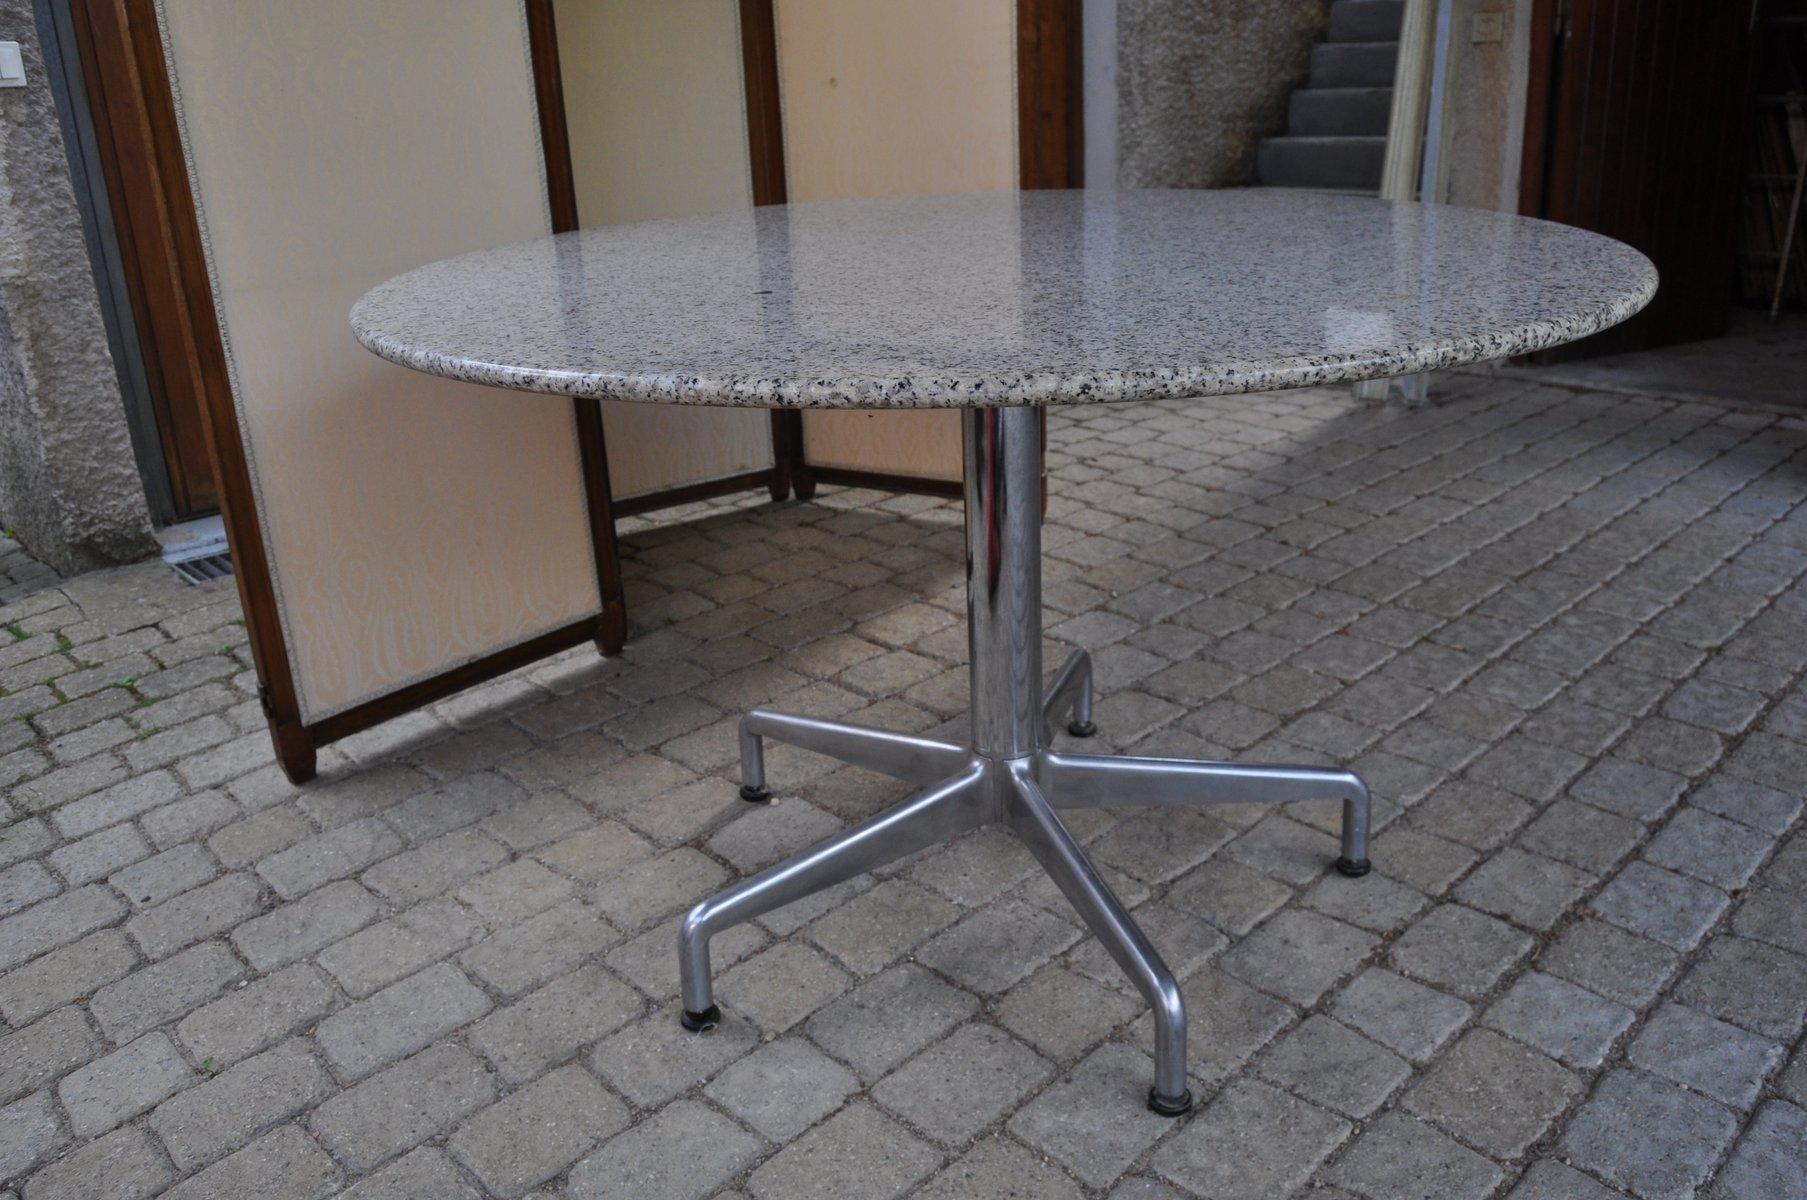 Table ronde de salle manger vintage en granite en vente sur pamono - Salle a manger en solde ...